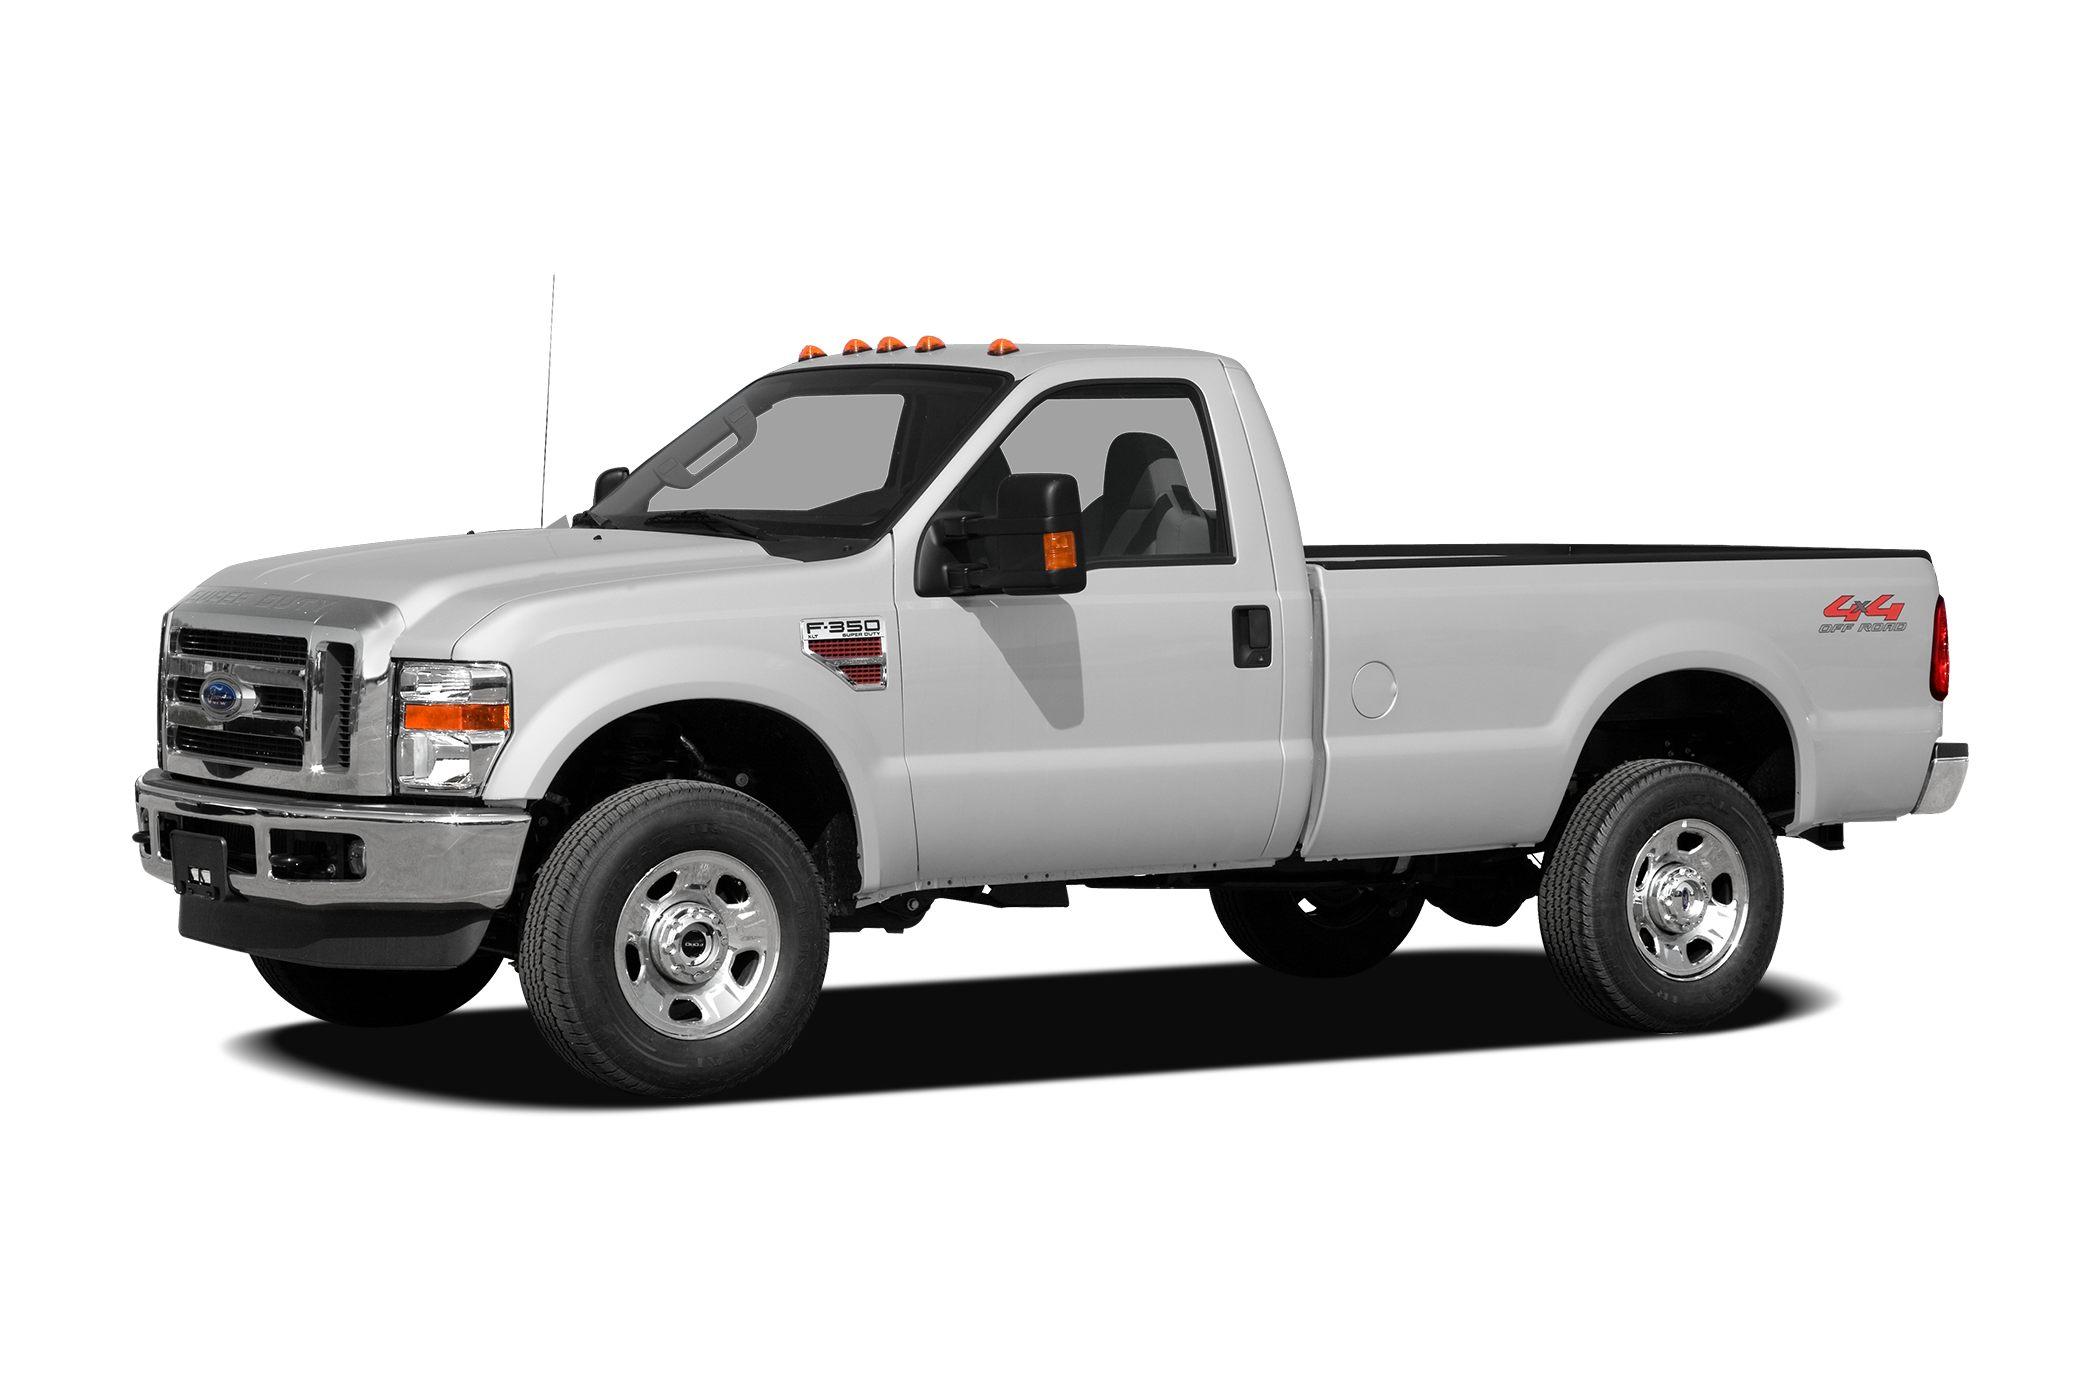 2008 Ford F-350  Miles 77586Color Silver Stock 16472 VIN 1FTWF31508EA90060